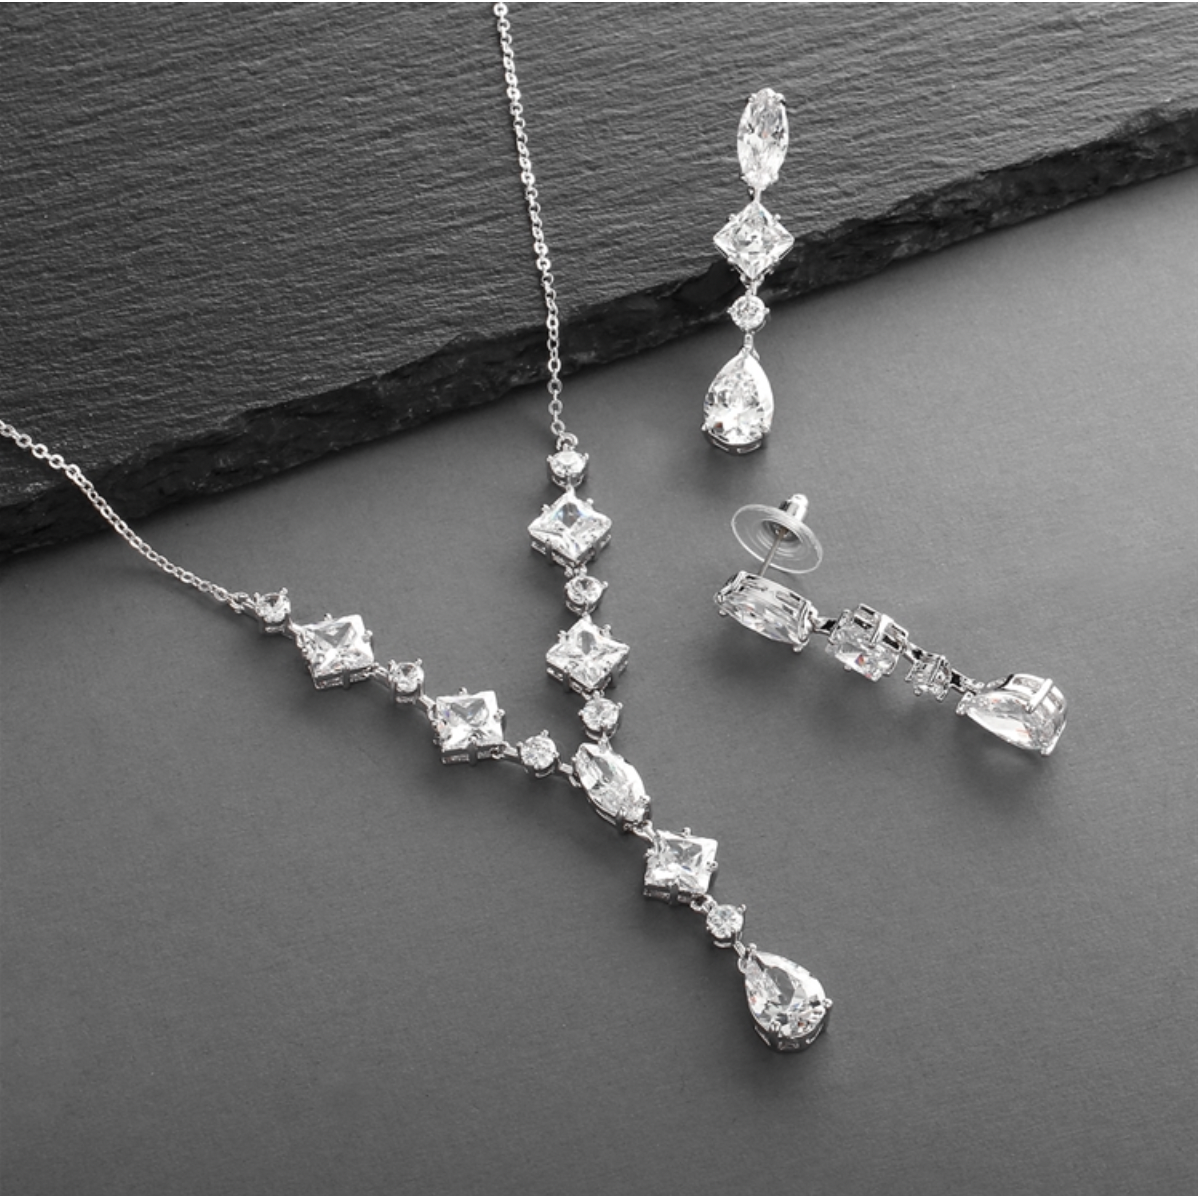 Glamorous Mixed Cubic Zirconia Necklace & Earrings Set